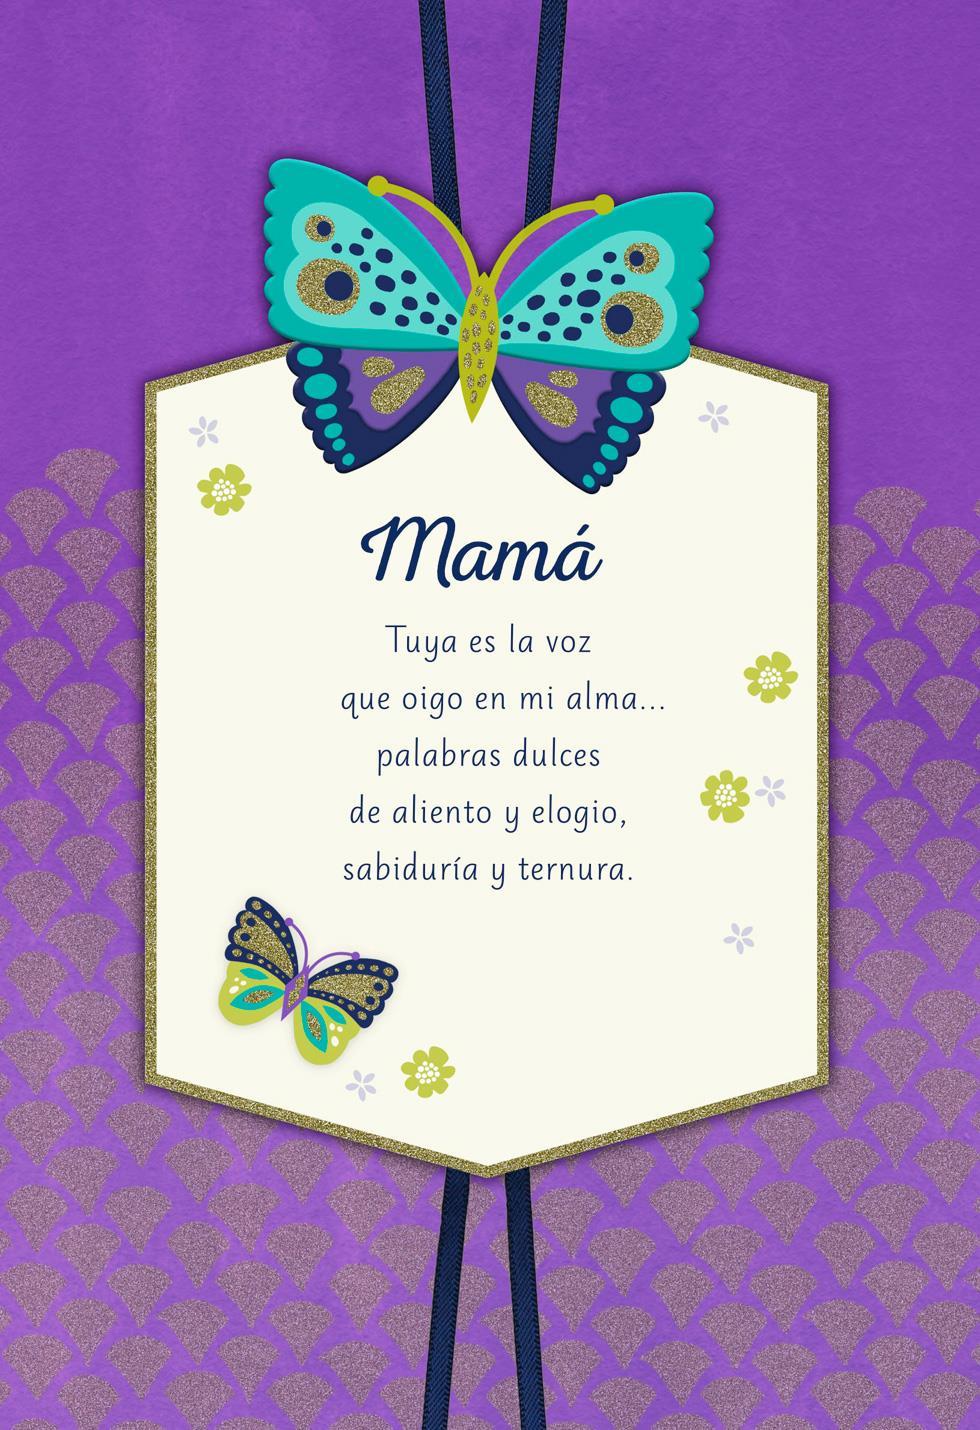 Your Voice Spanish Language Birthday Card For Mom Greeting Cards Hallmark